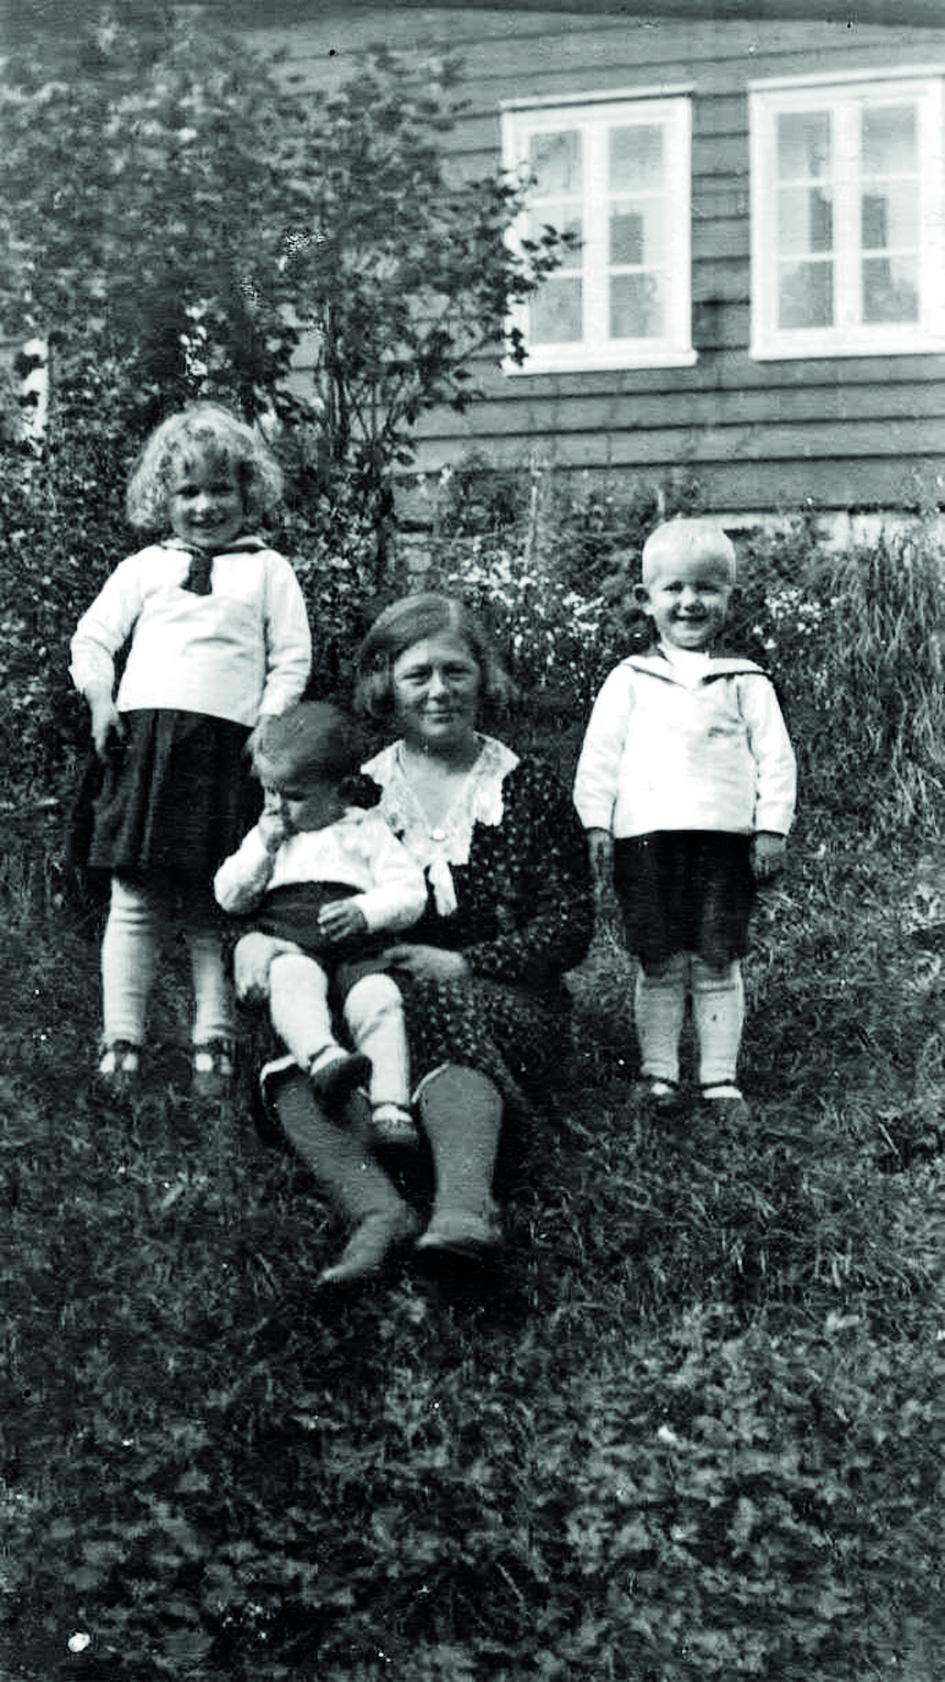 Høgre: Hilda Lunden (fødd 1901) med borna Dagunn (f.1928), Kåre (f. 1930) og Steinar (f. 1931). Foto: Ludvik Lunden 1933.